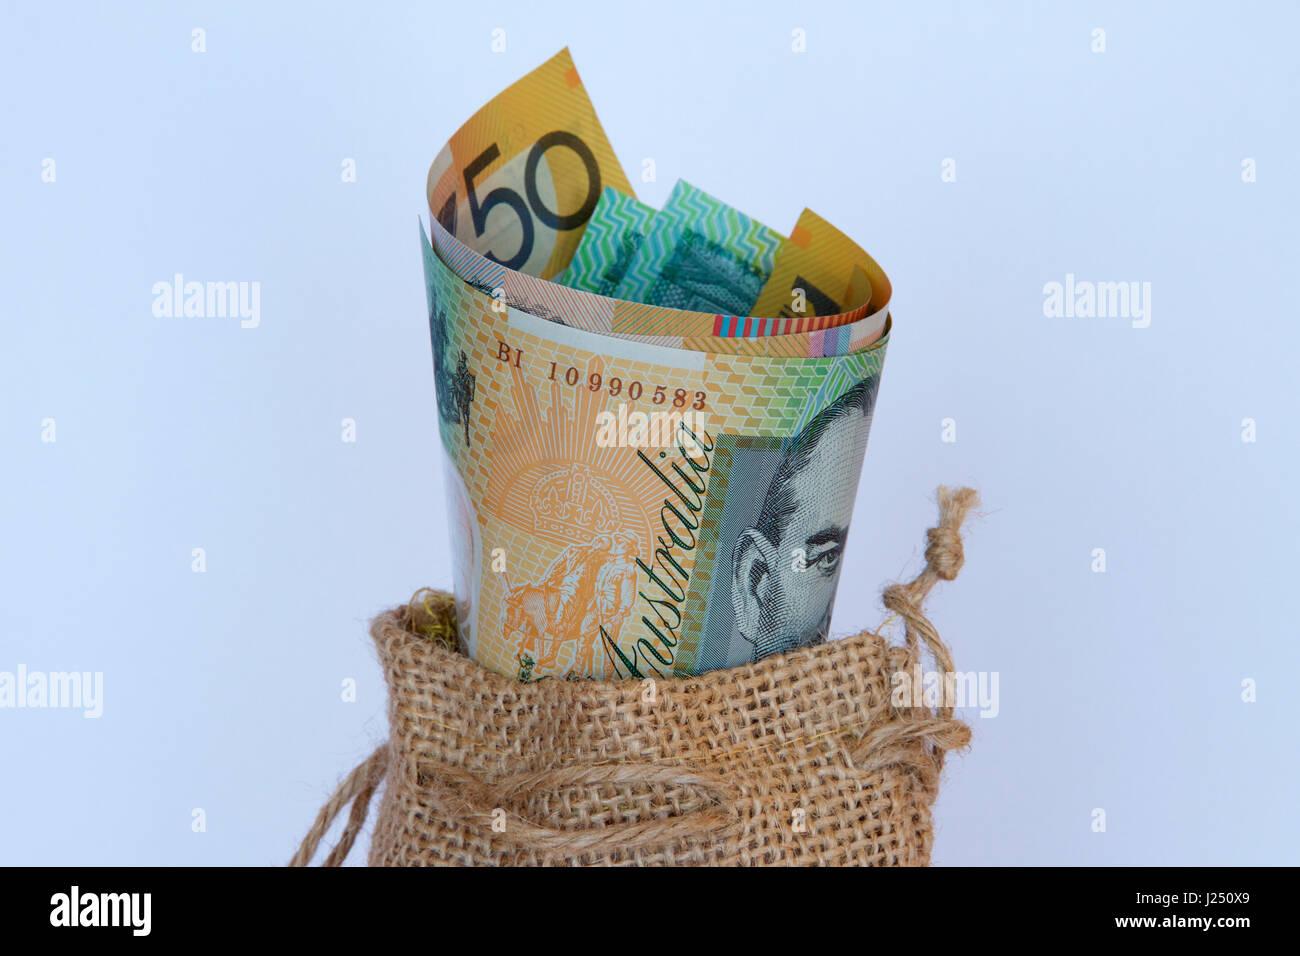 Australian dollars in a hessian bag. - Stock Image